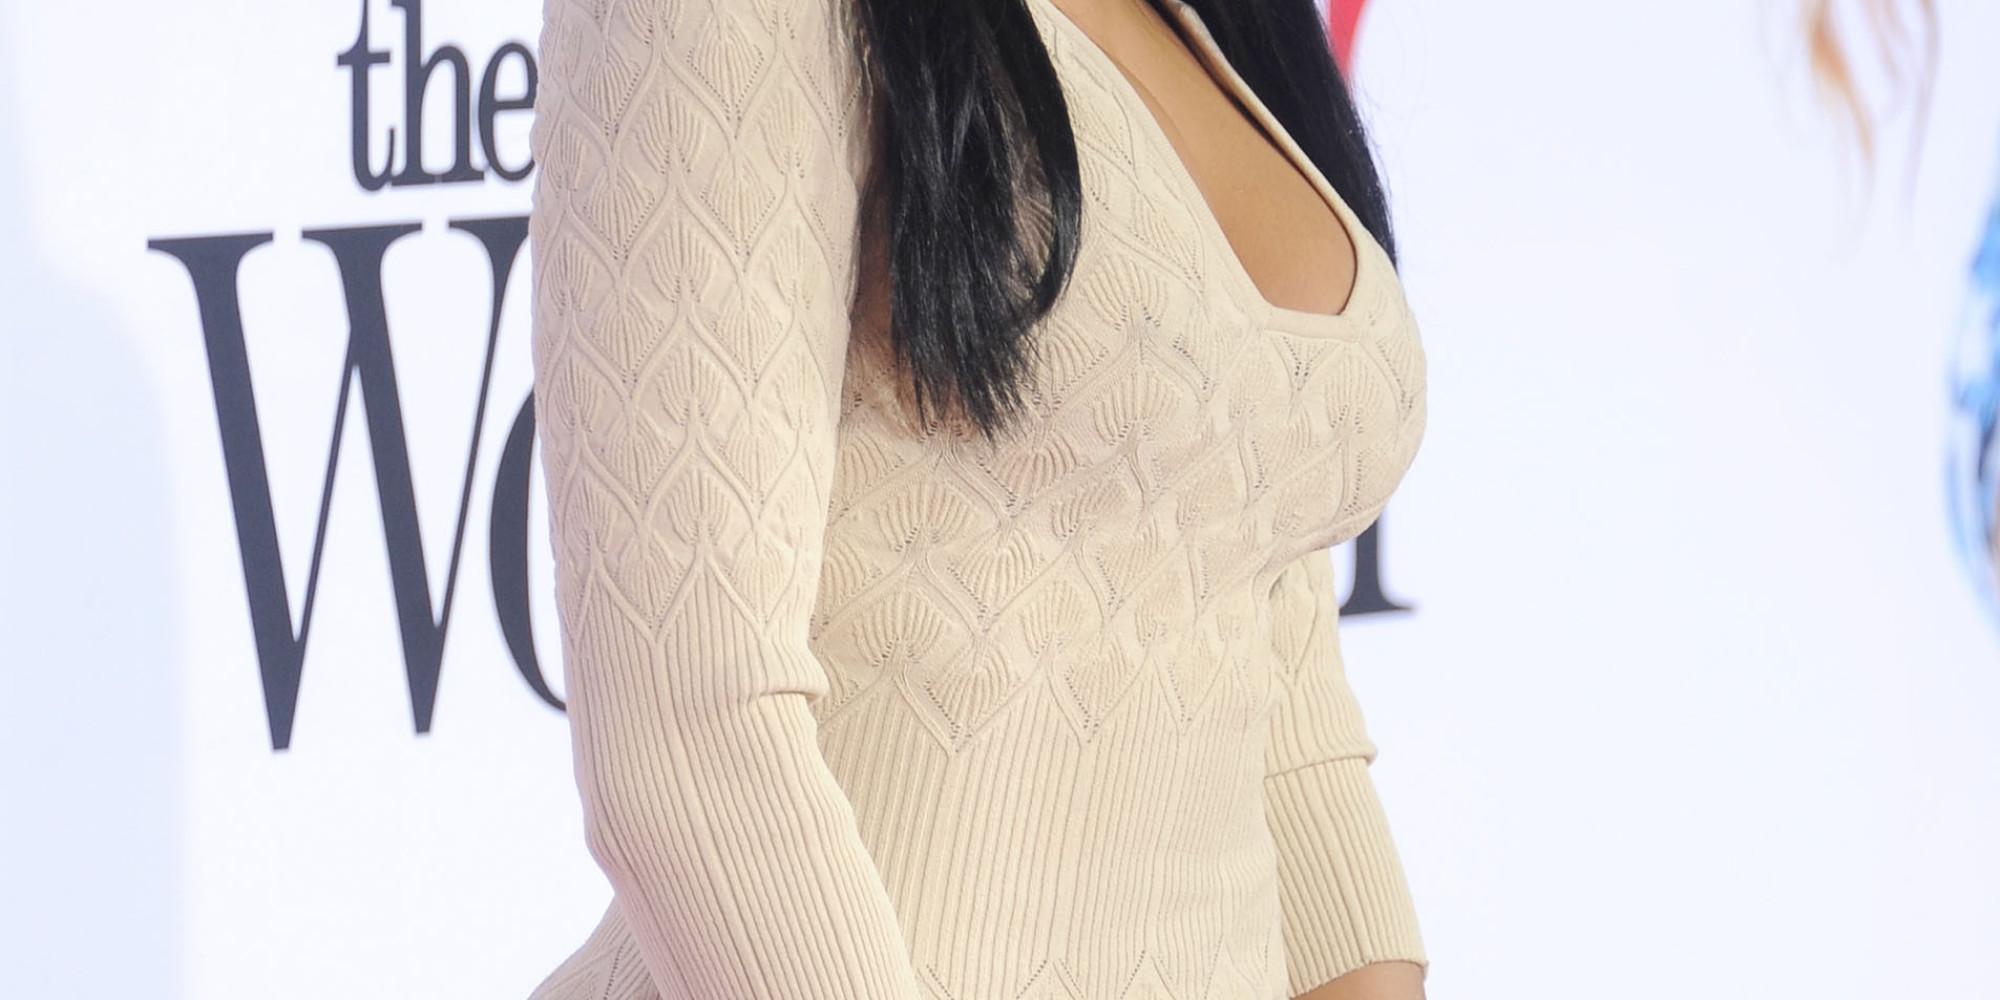 Nicki Minaj Wears See Through Tights O-nicki-minaj-facebook.jpg